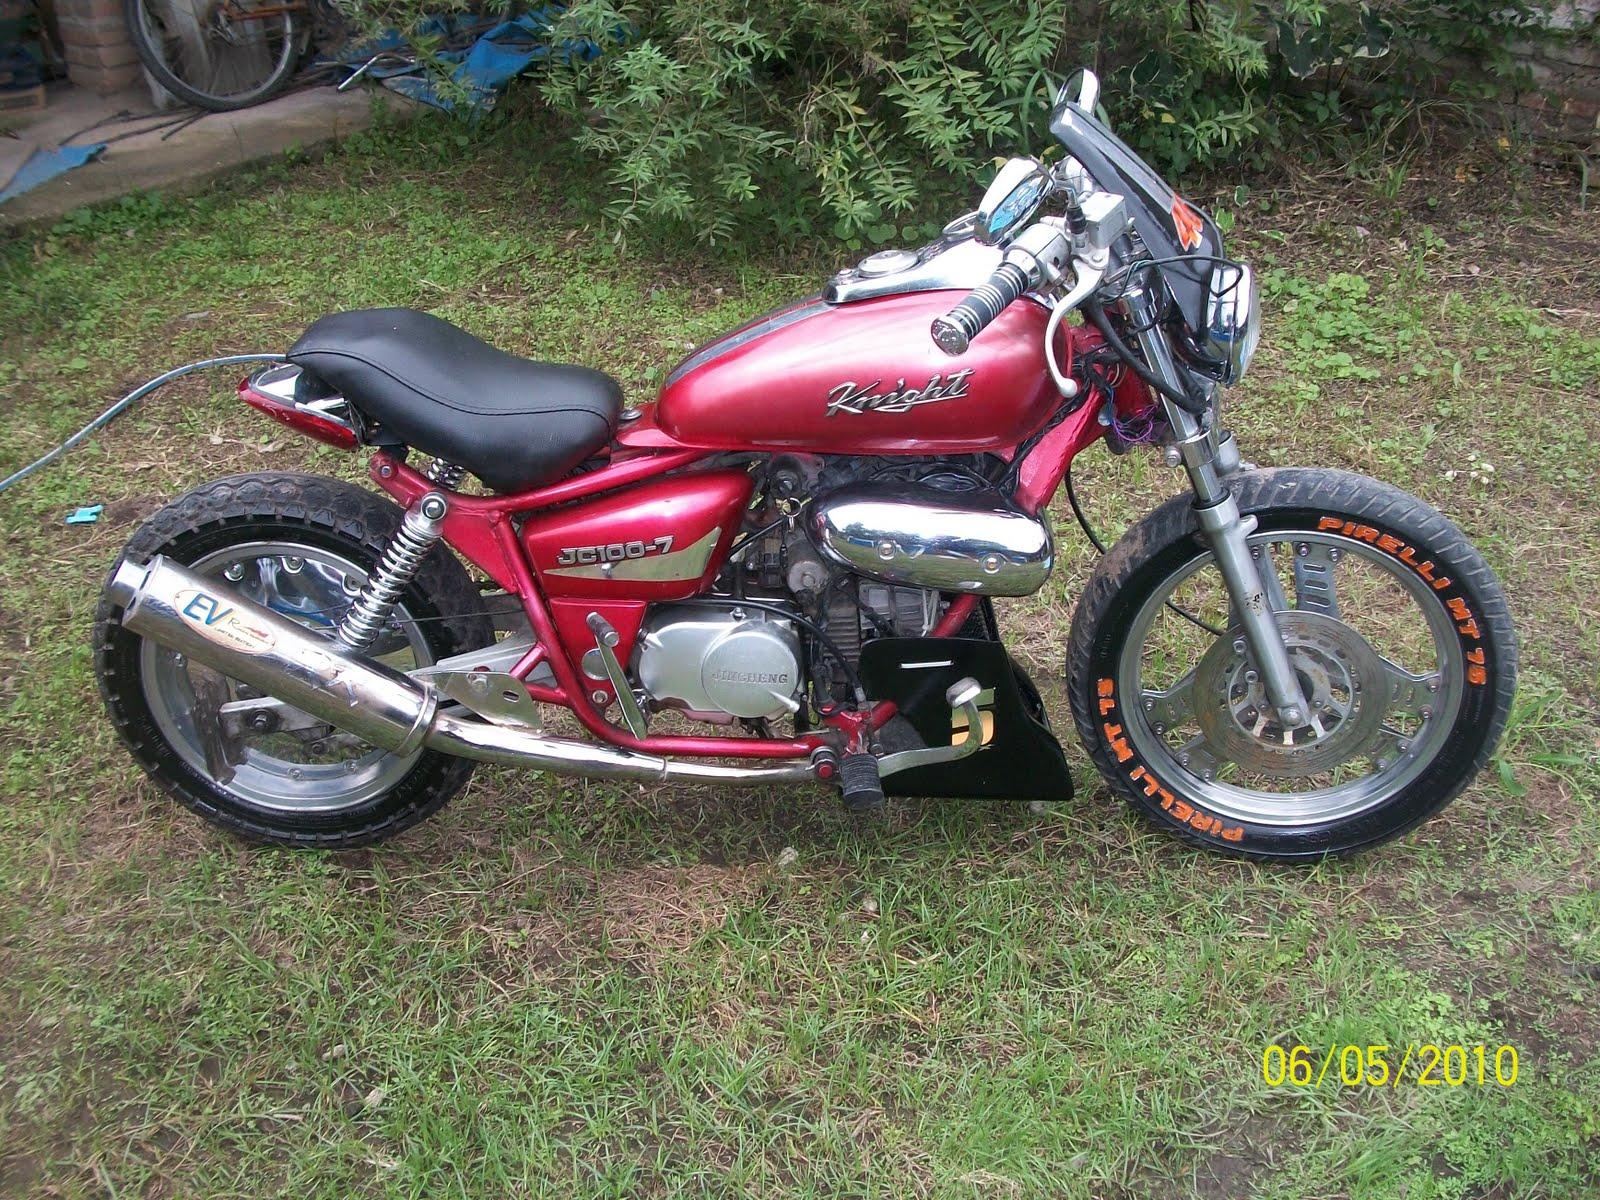 Las mejores fotos de motos! (motos tuneadas y motos raras